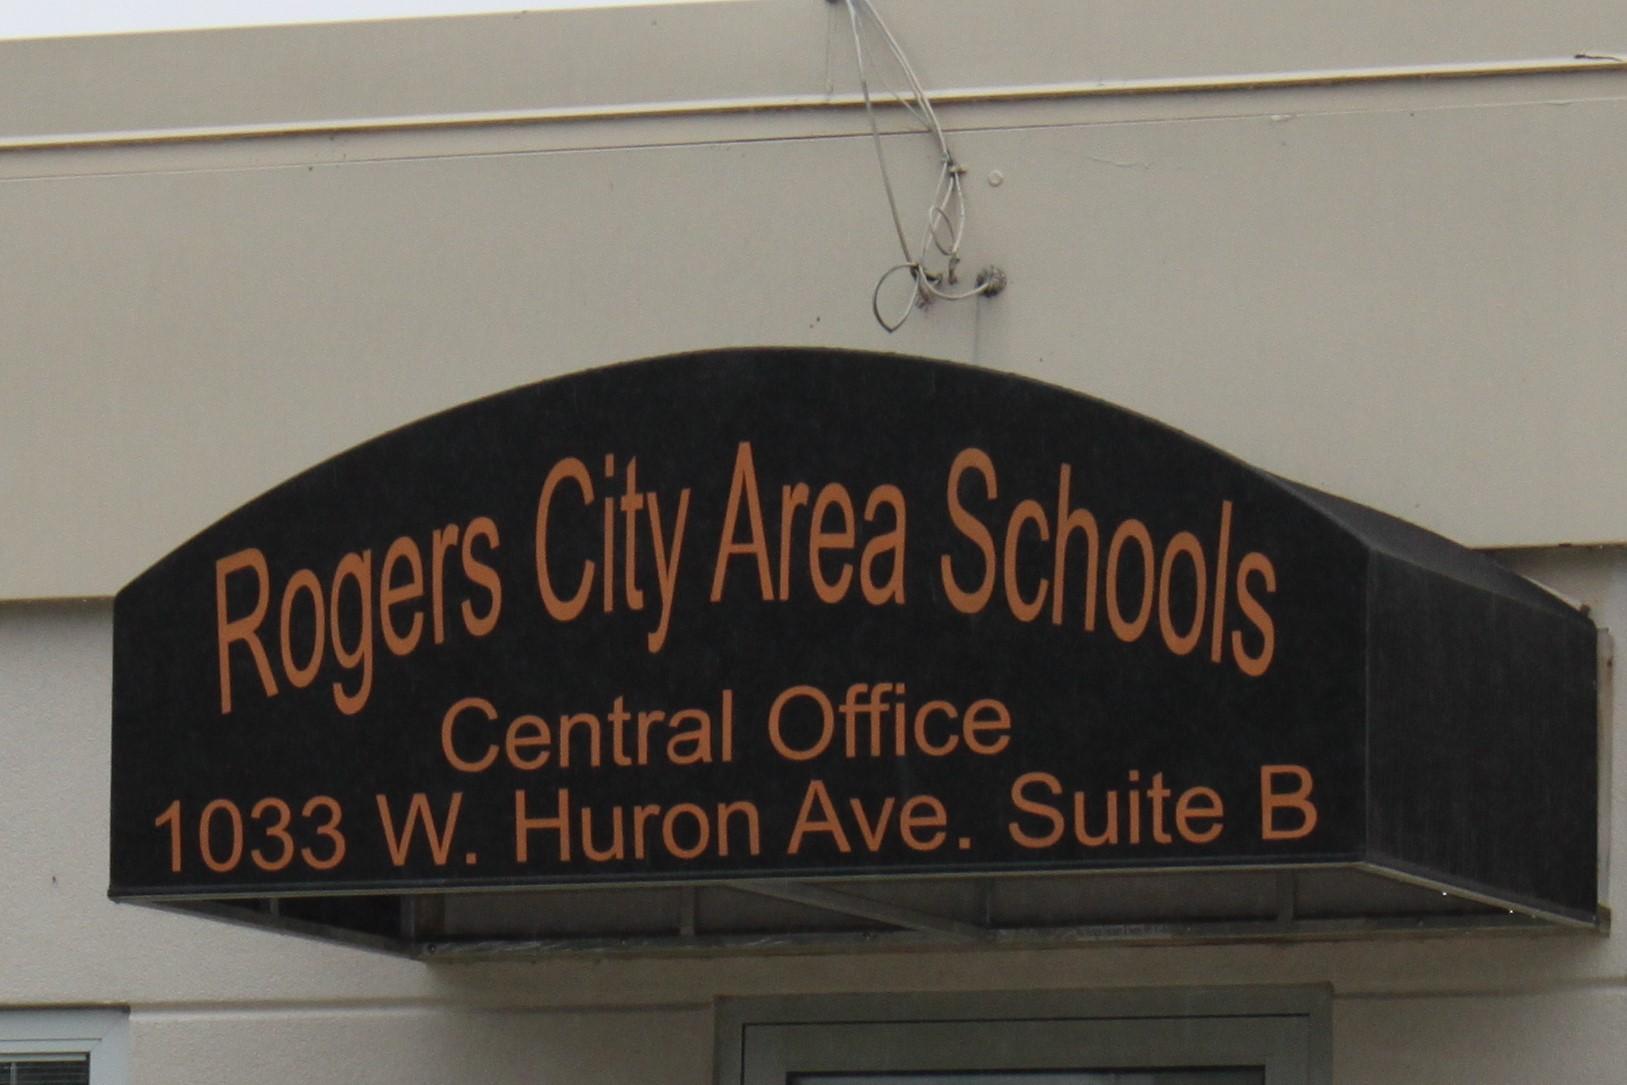 Rogers City Area Schools